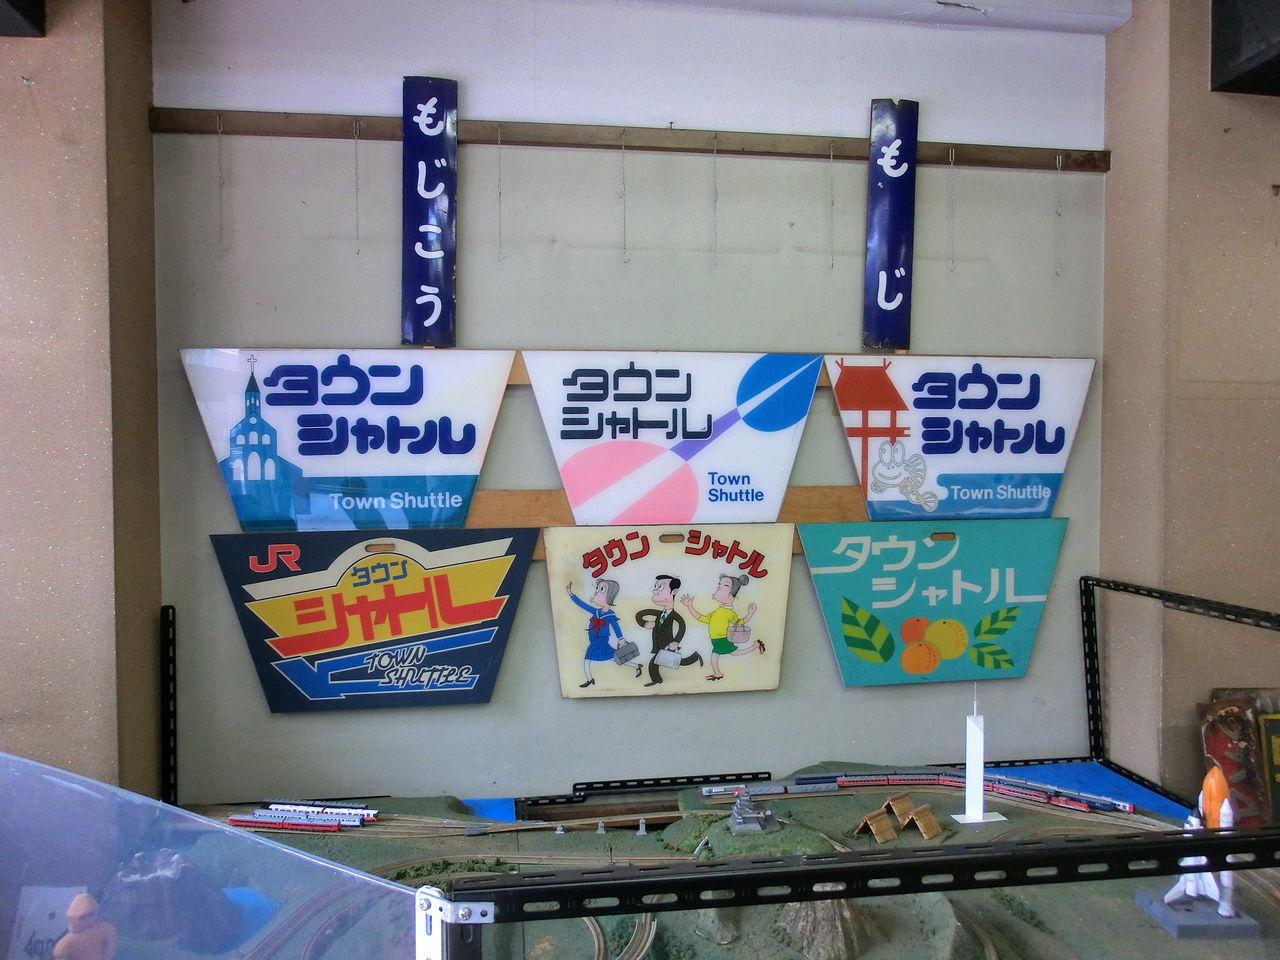 http://livedoor.blogimg.jp/p901is-tabi/imgs/f/0/f02f9279.jpg